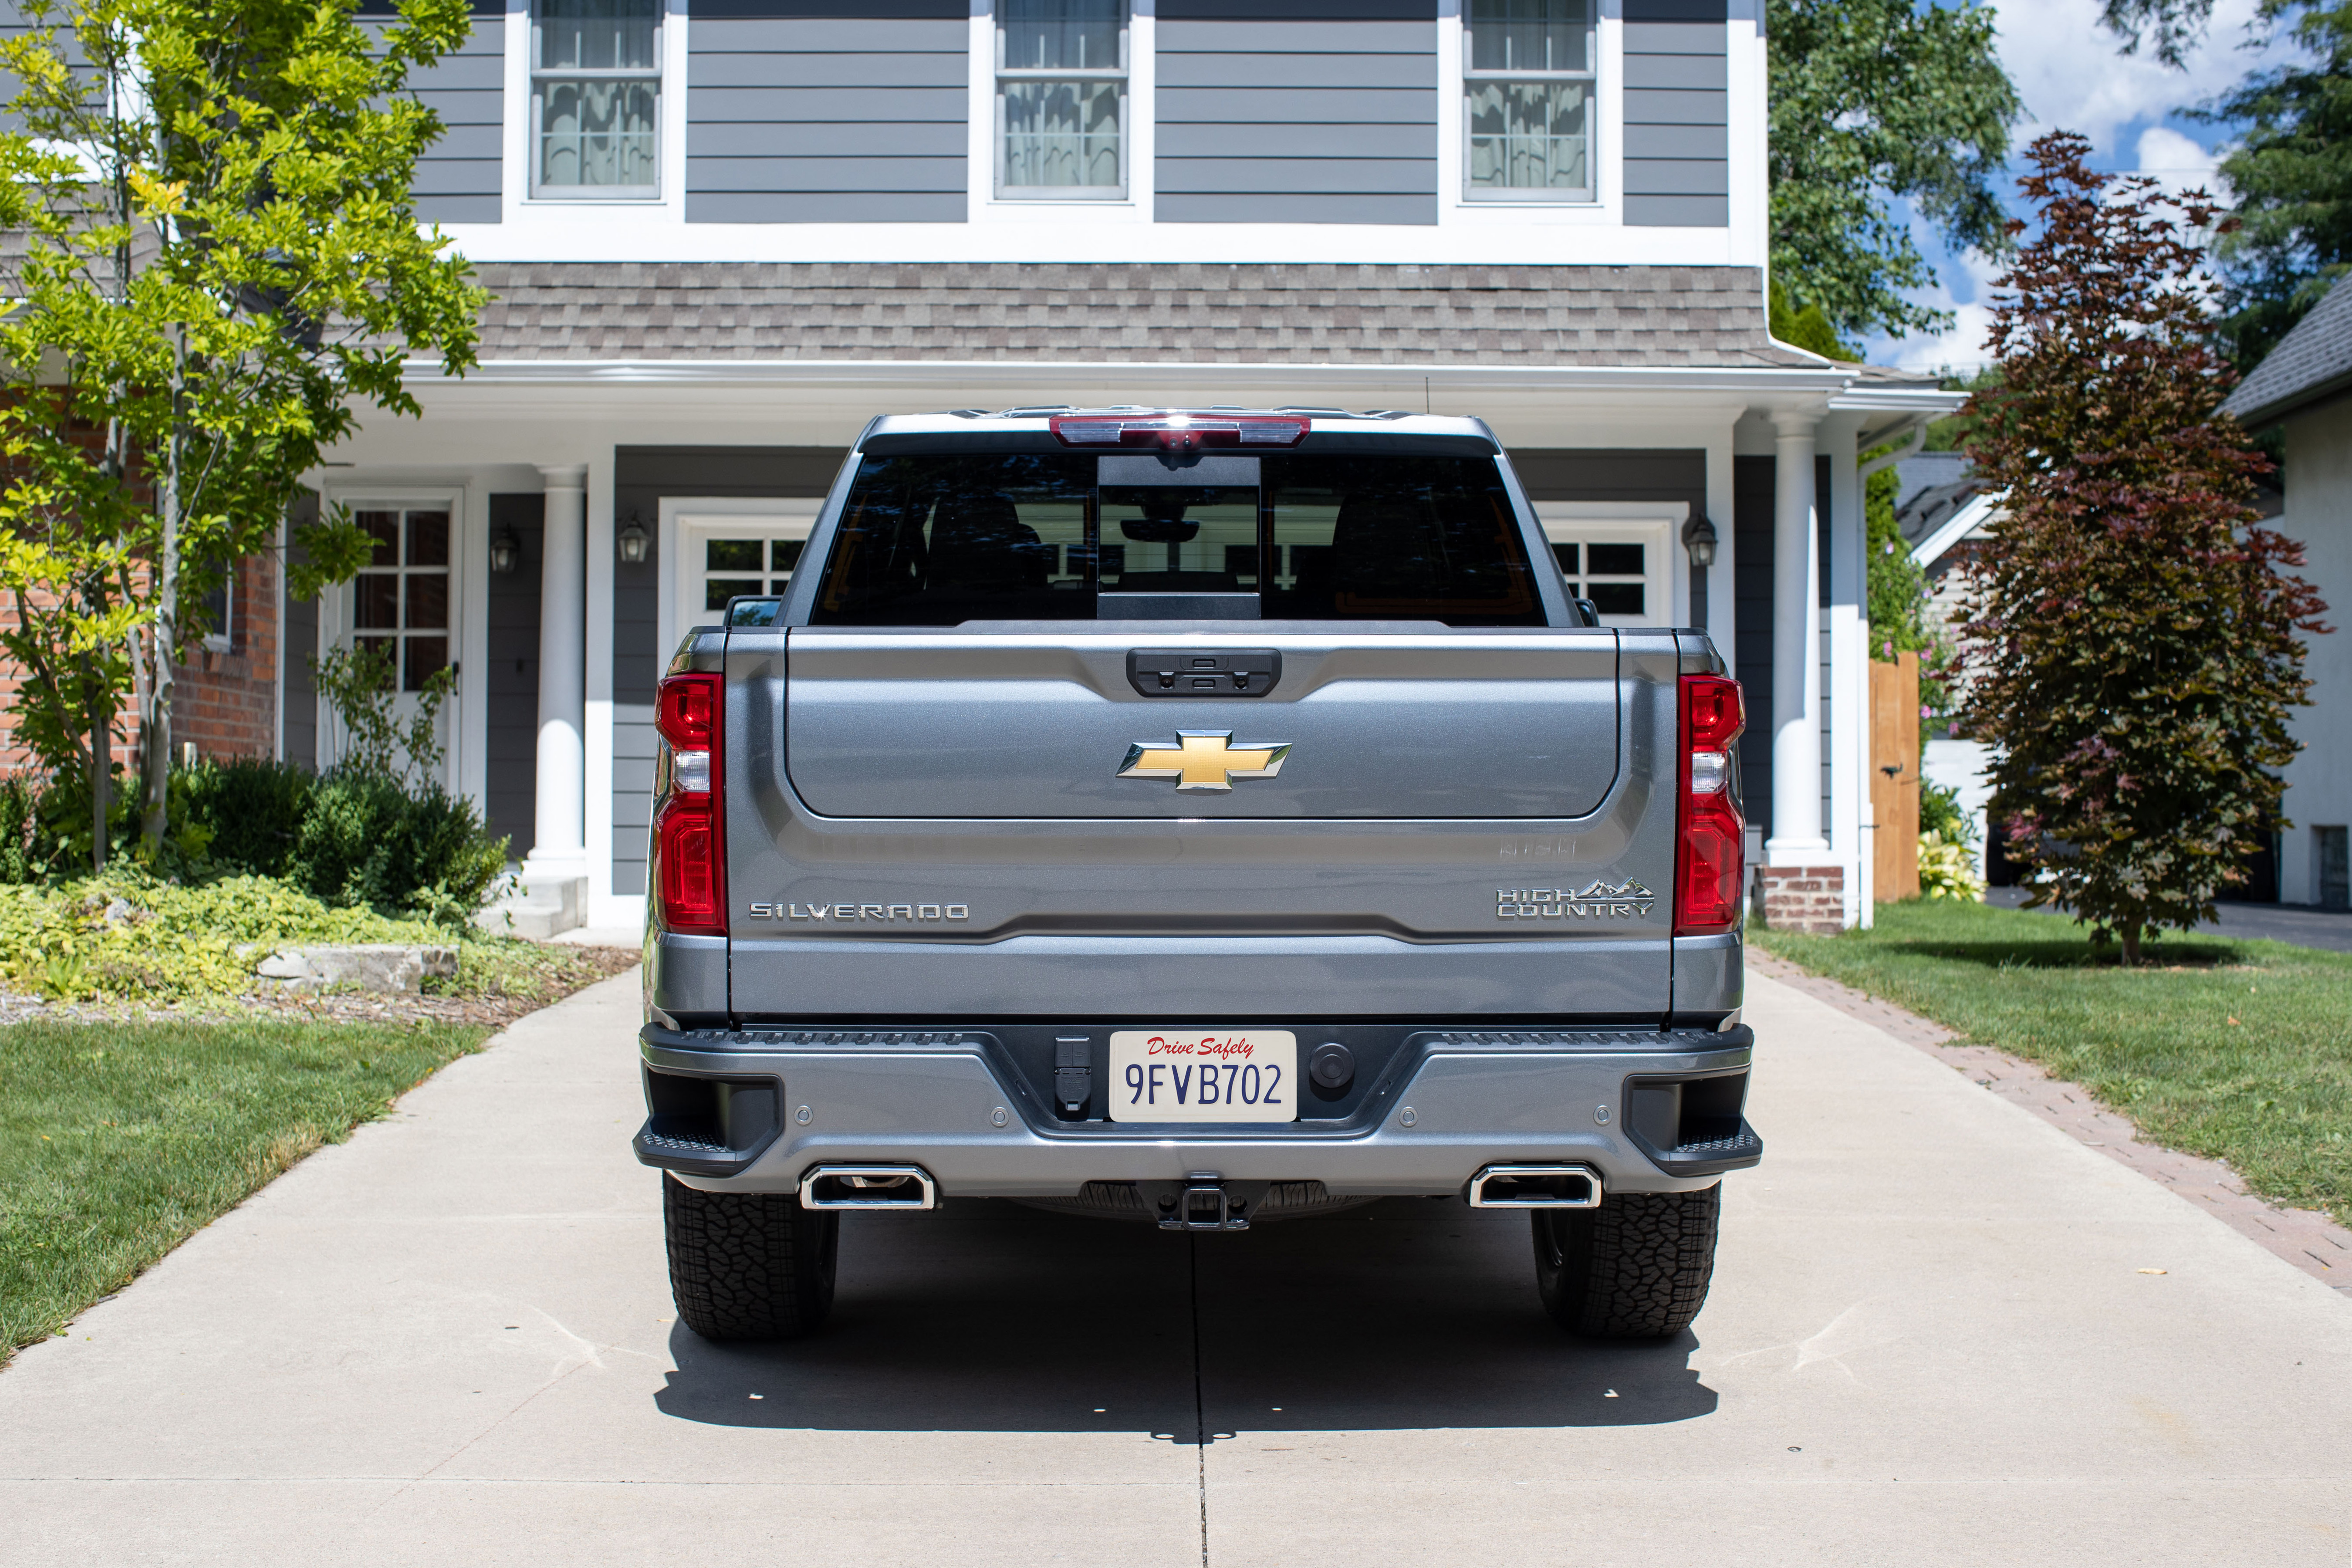 2021 Chevrolet Silverado 1500 Adds New Multi Flex Tailgate And Trailering Enhancements